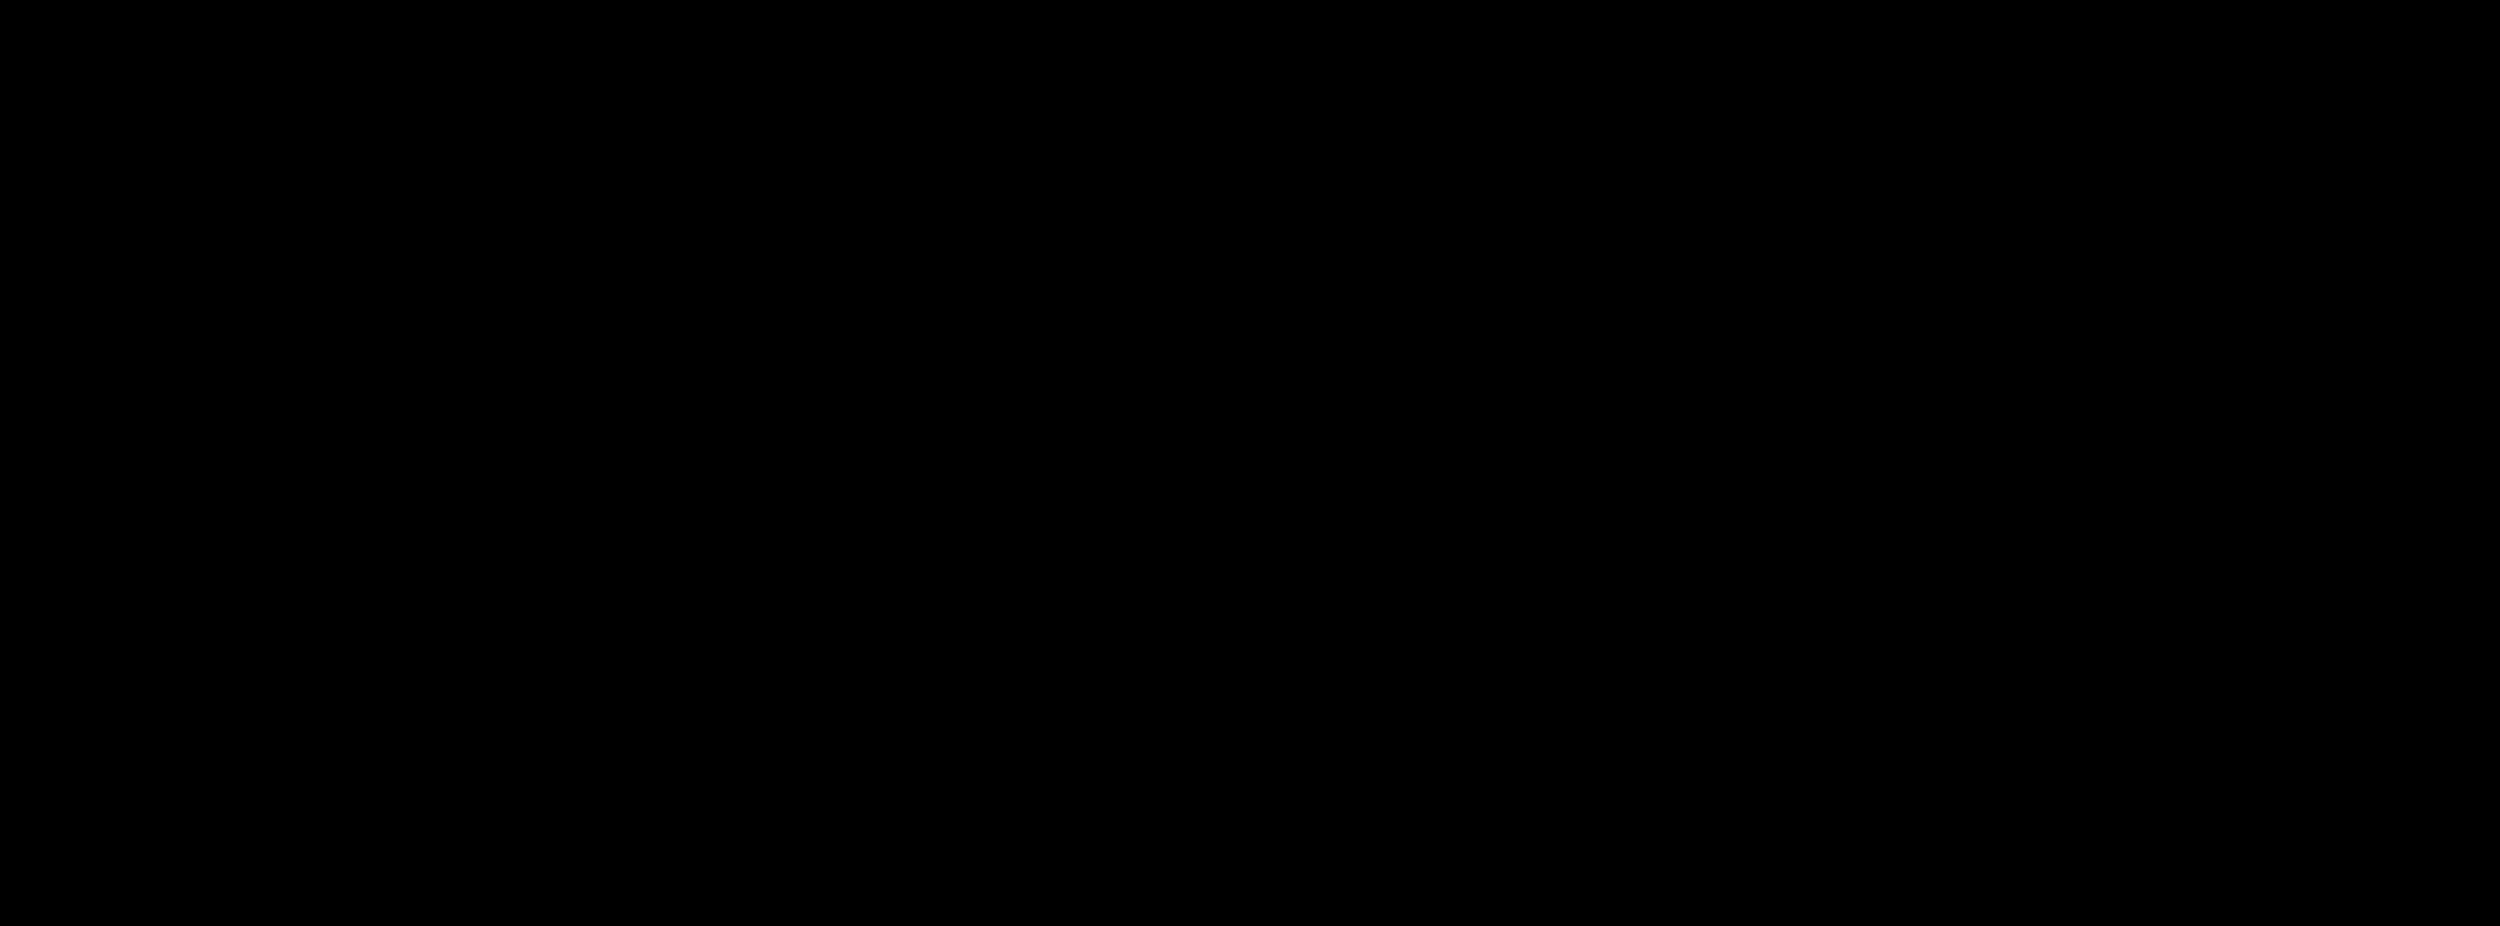 TA.FinalLogo5 (1).png